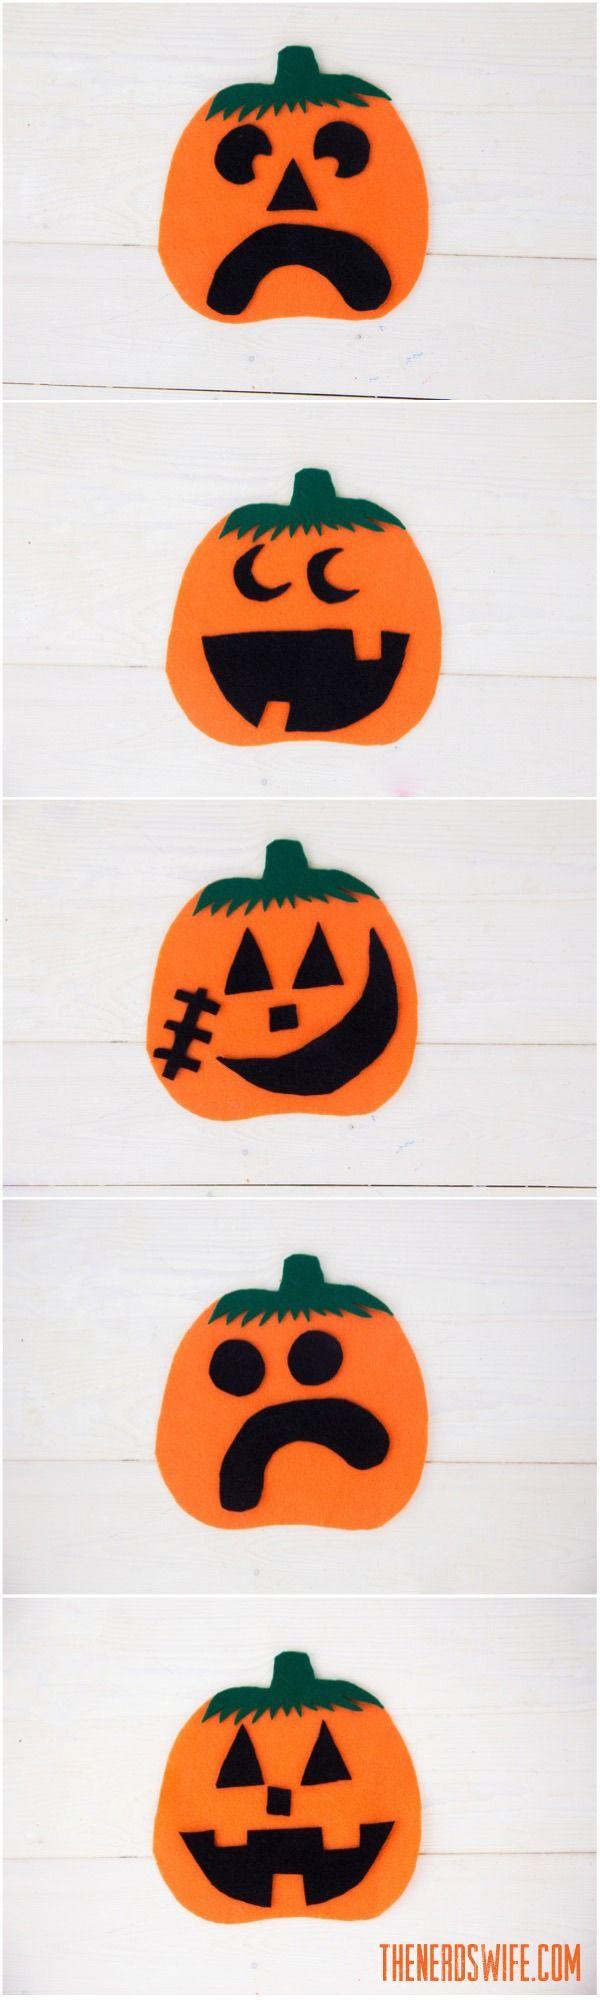 Free Printable Halloween Craft Templates